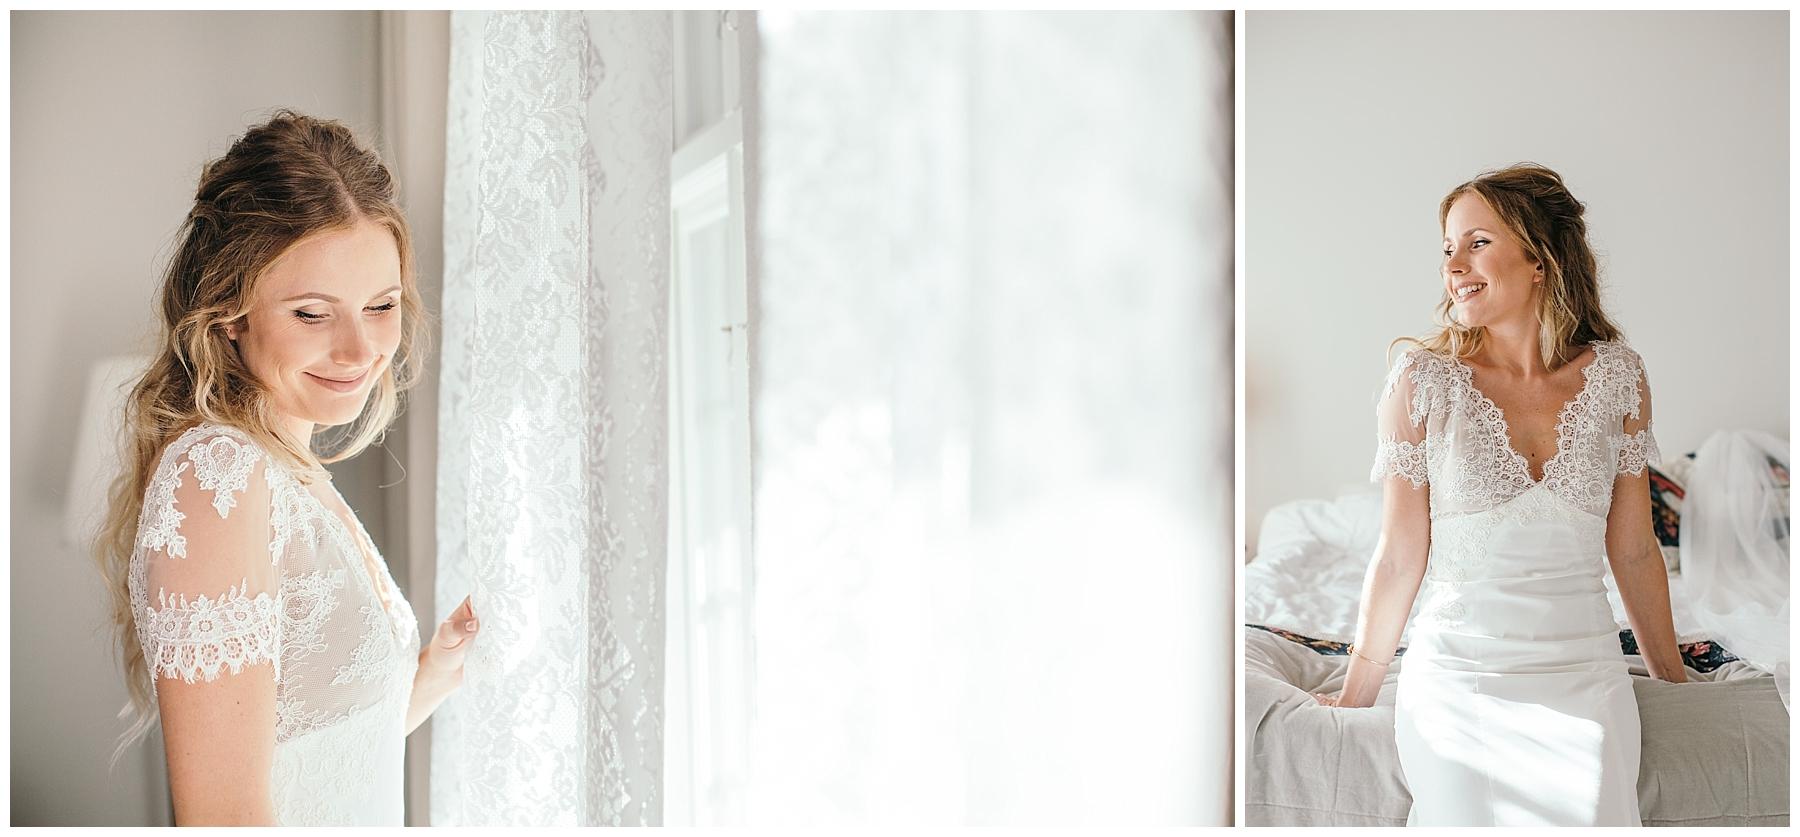 barnfotografering i studio stockholm tullinge